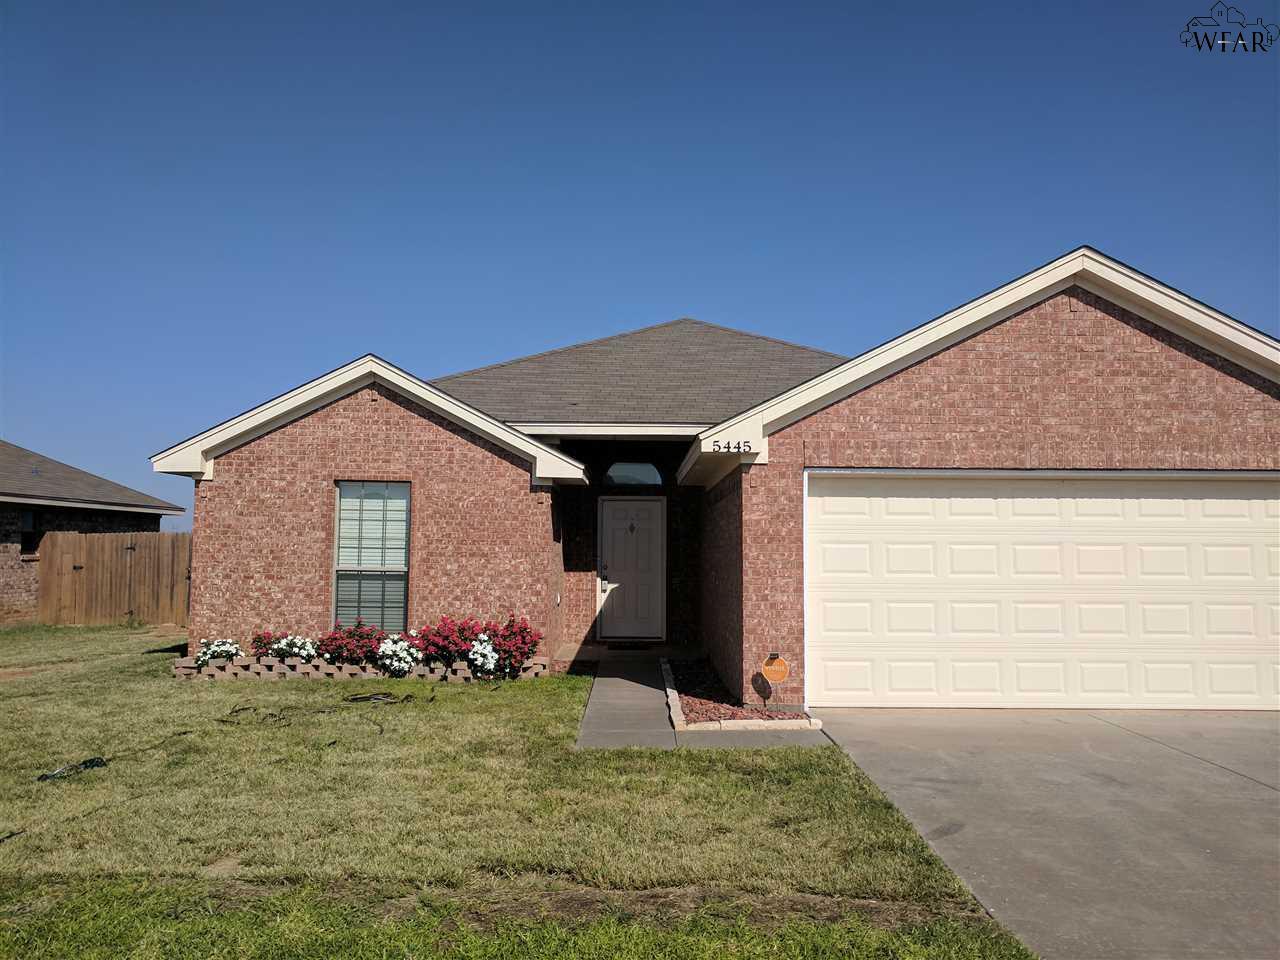 5445 Carlson Street, Wichita Falls, TX 76302